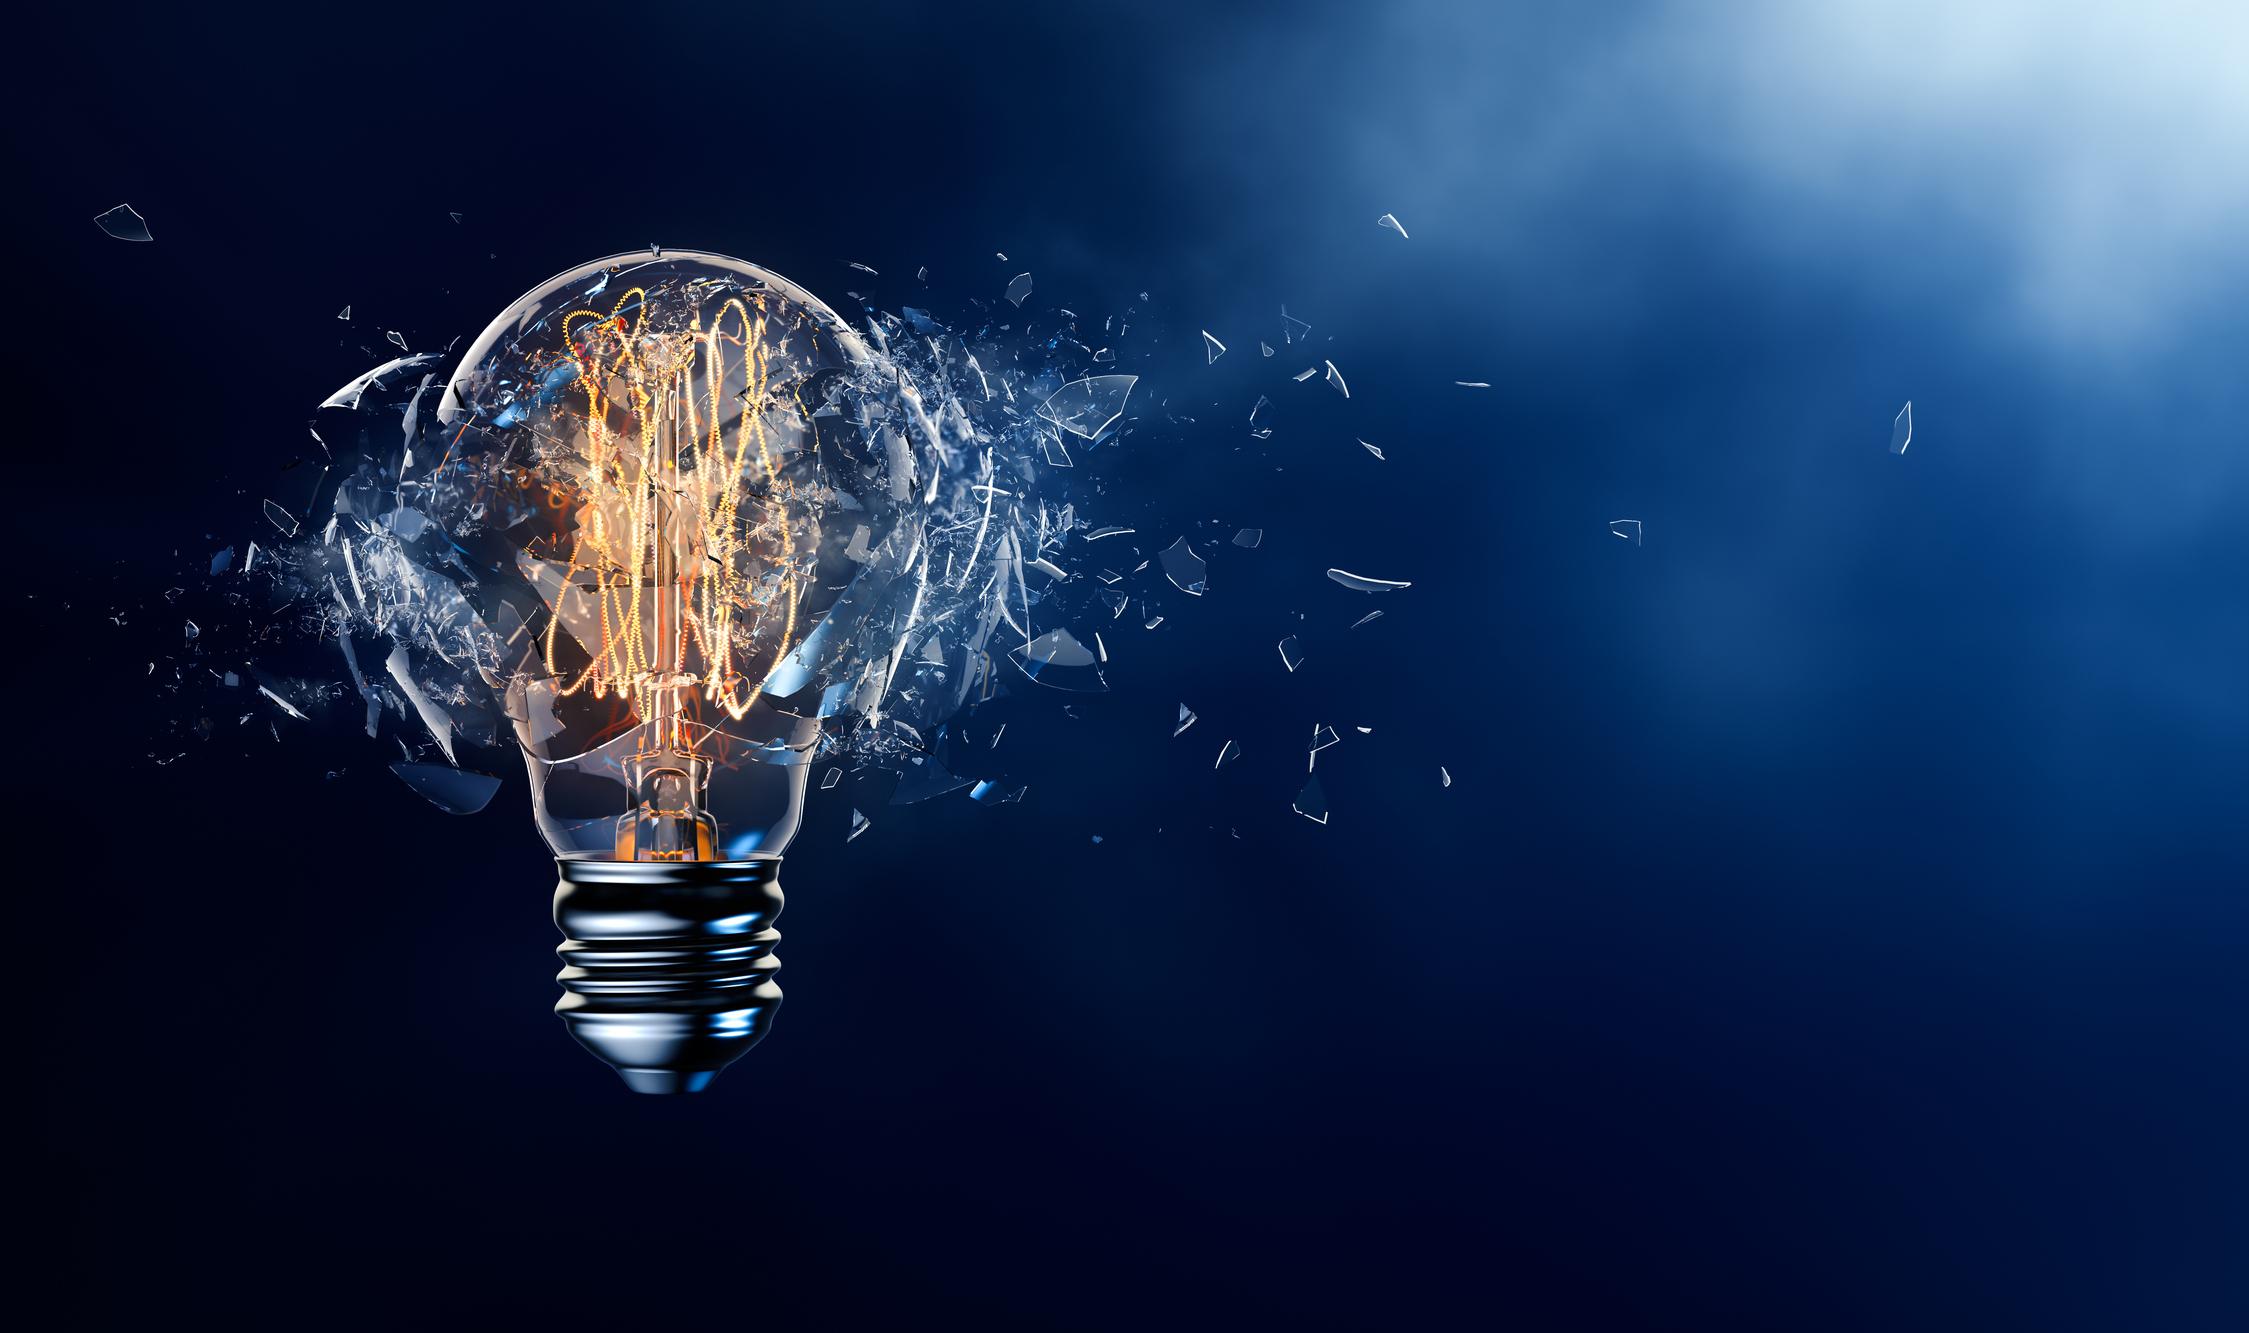 A shattering Edison-style light bulb.